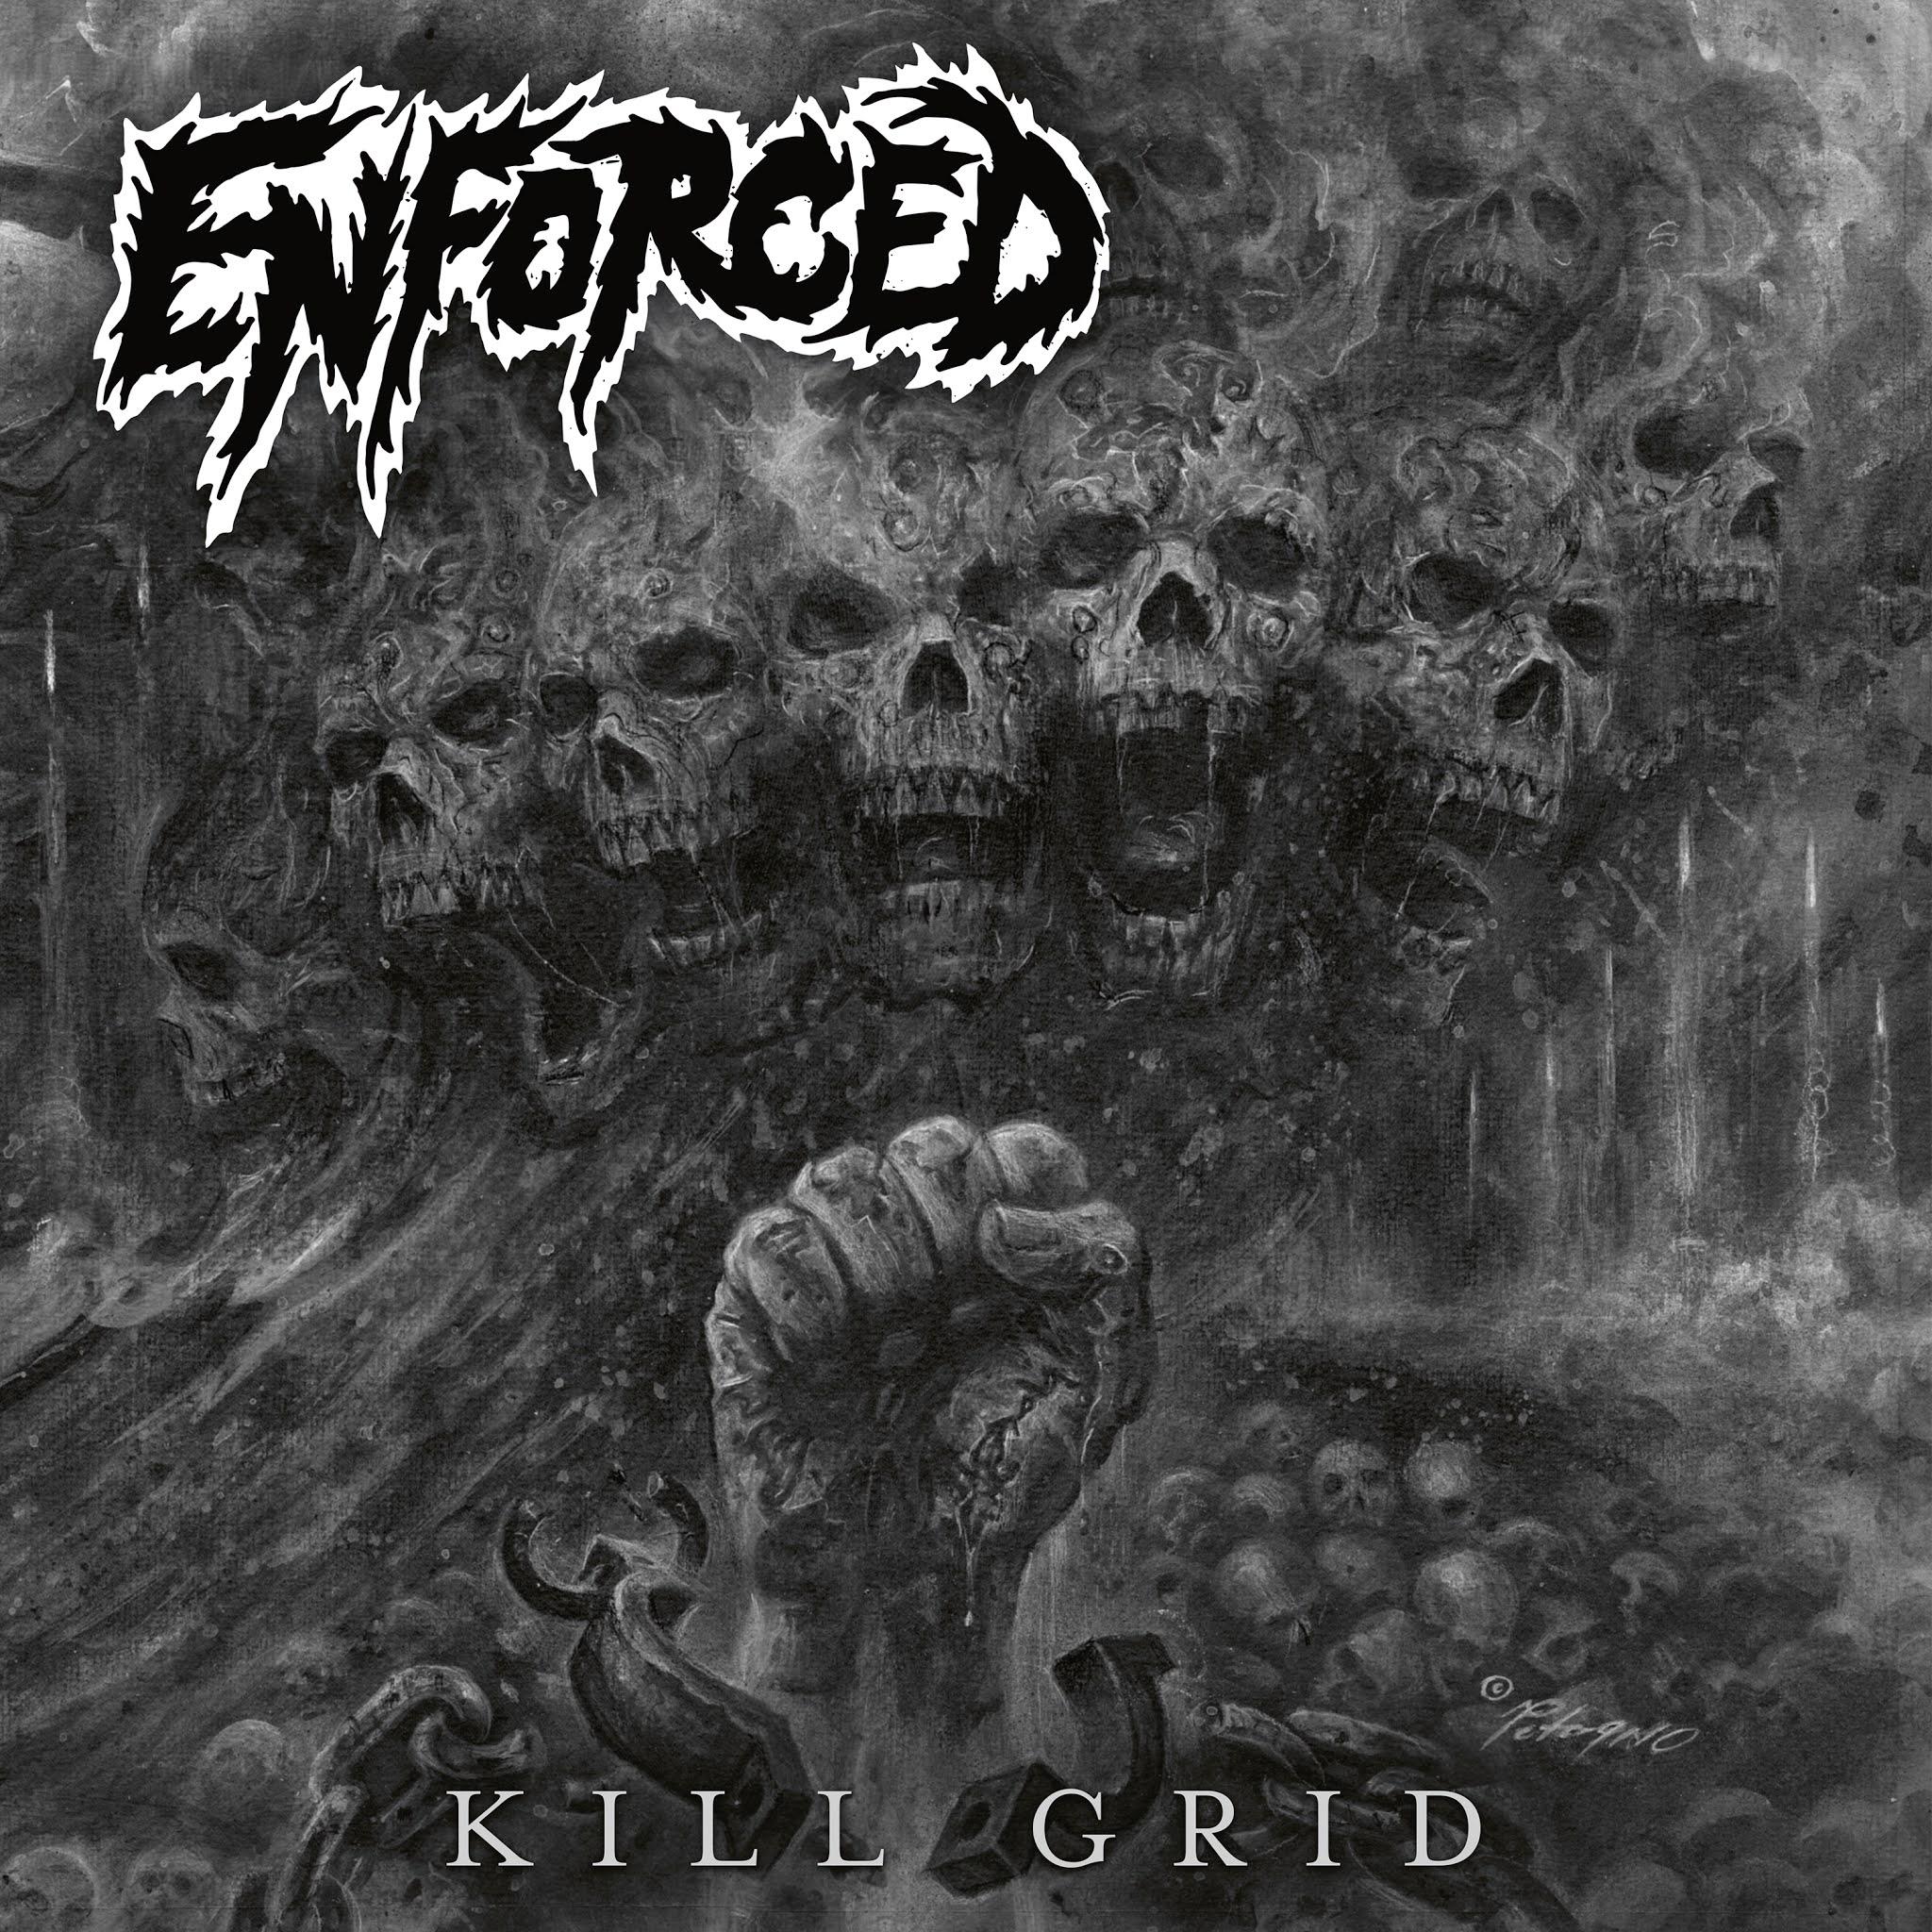 Enforced cover artwork kill grid